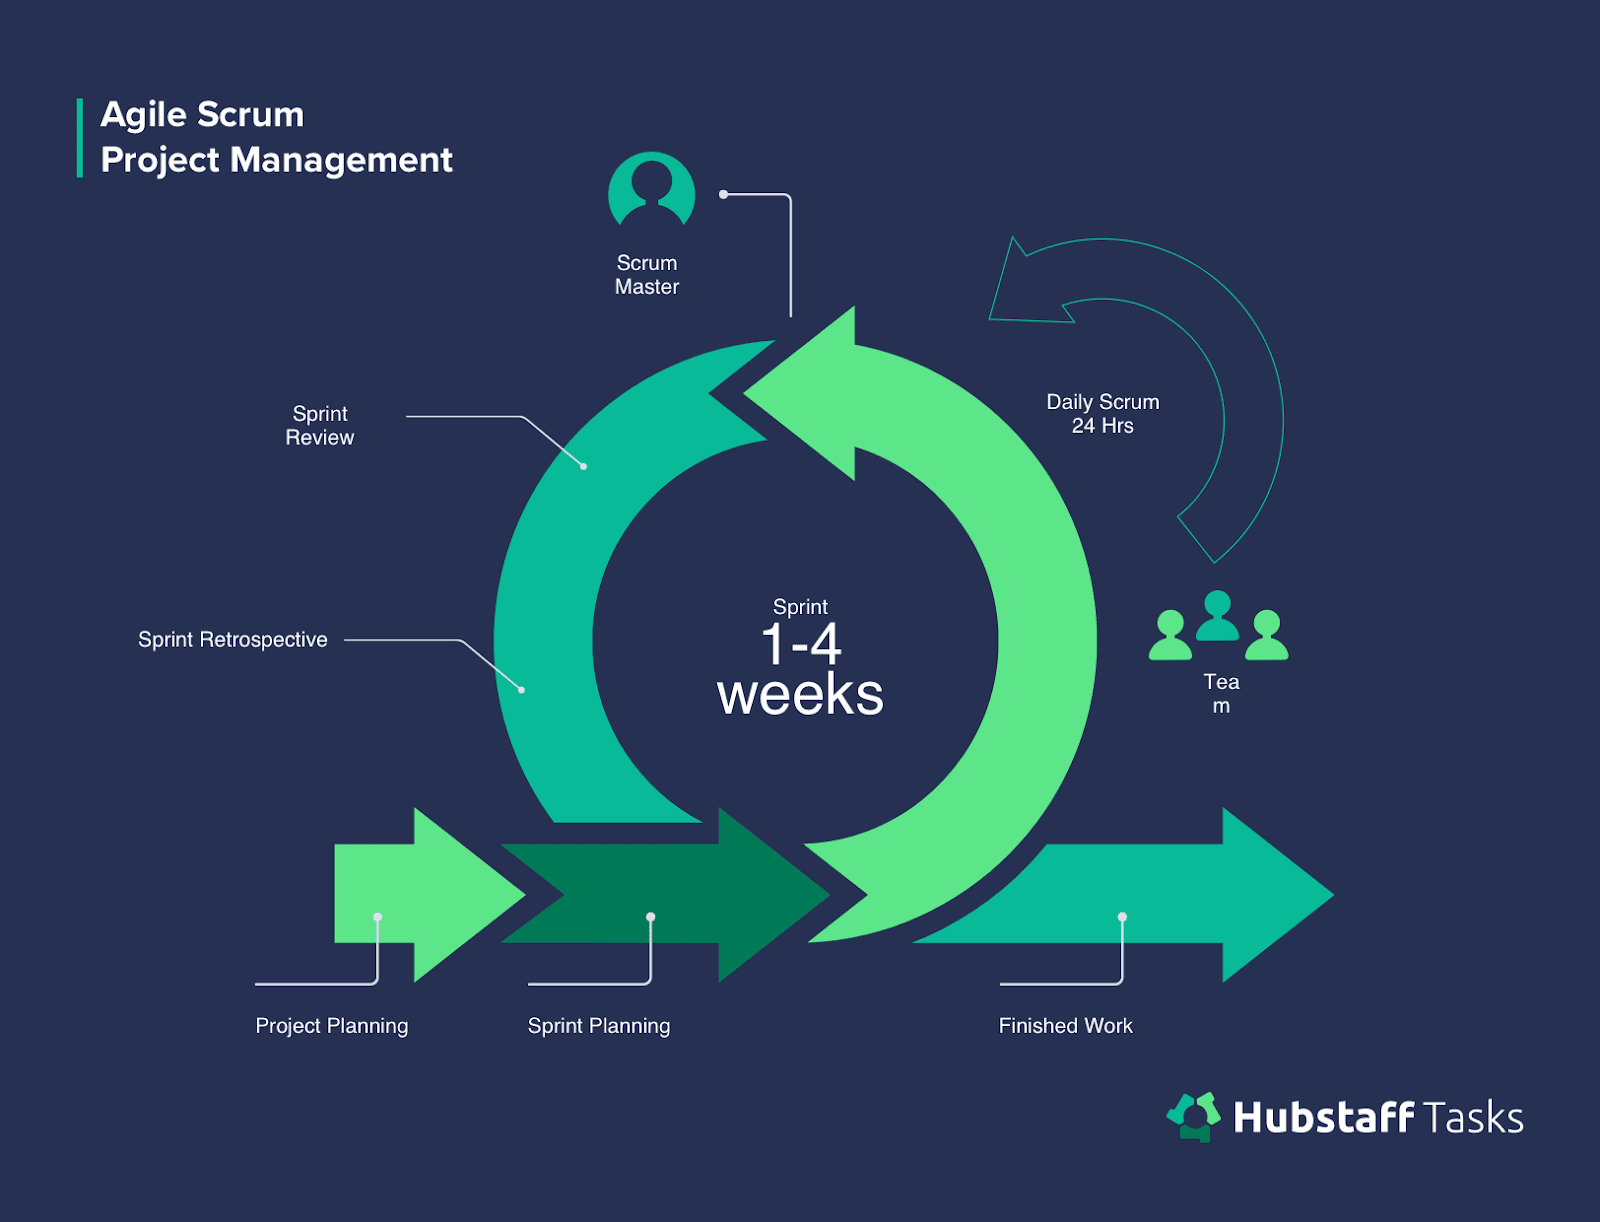 Agile Scrum project management